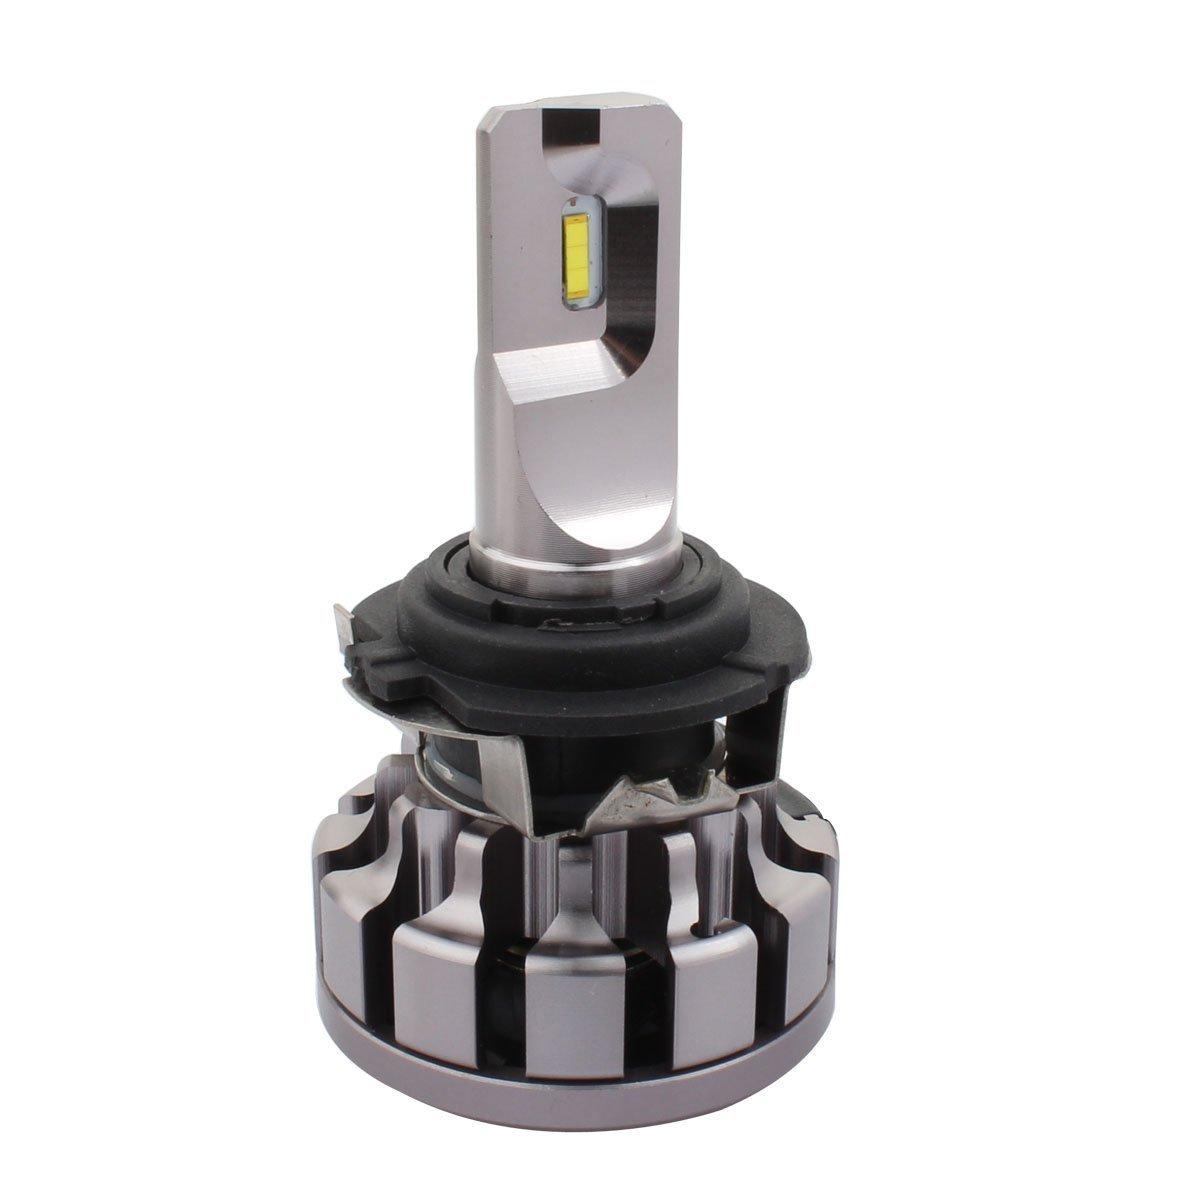 TOMALL H7 LED Retenedores de faros Retenedores Adaptador para VW Passat Touareg SAAB Mercedes Benz B Clase ML